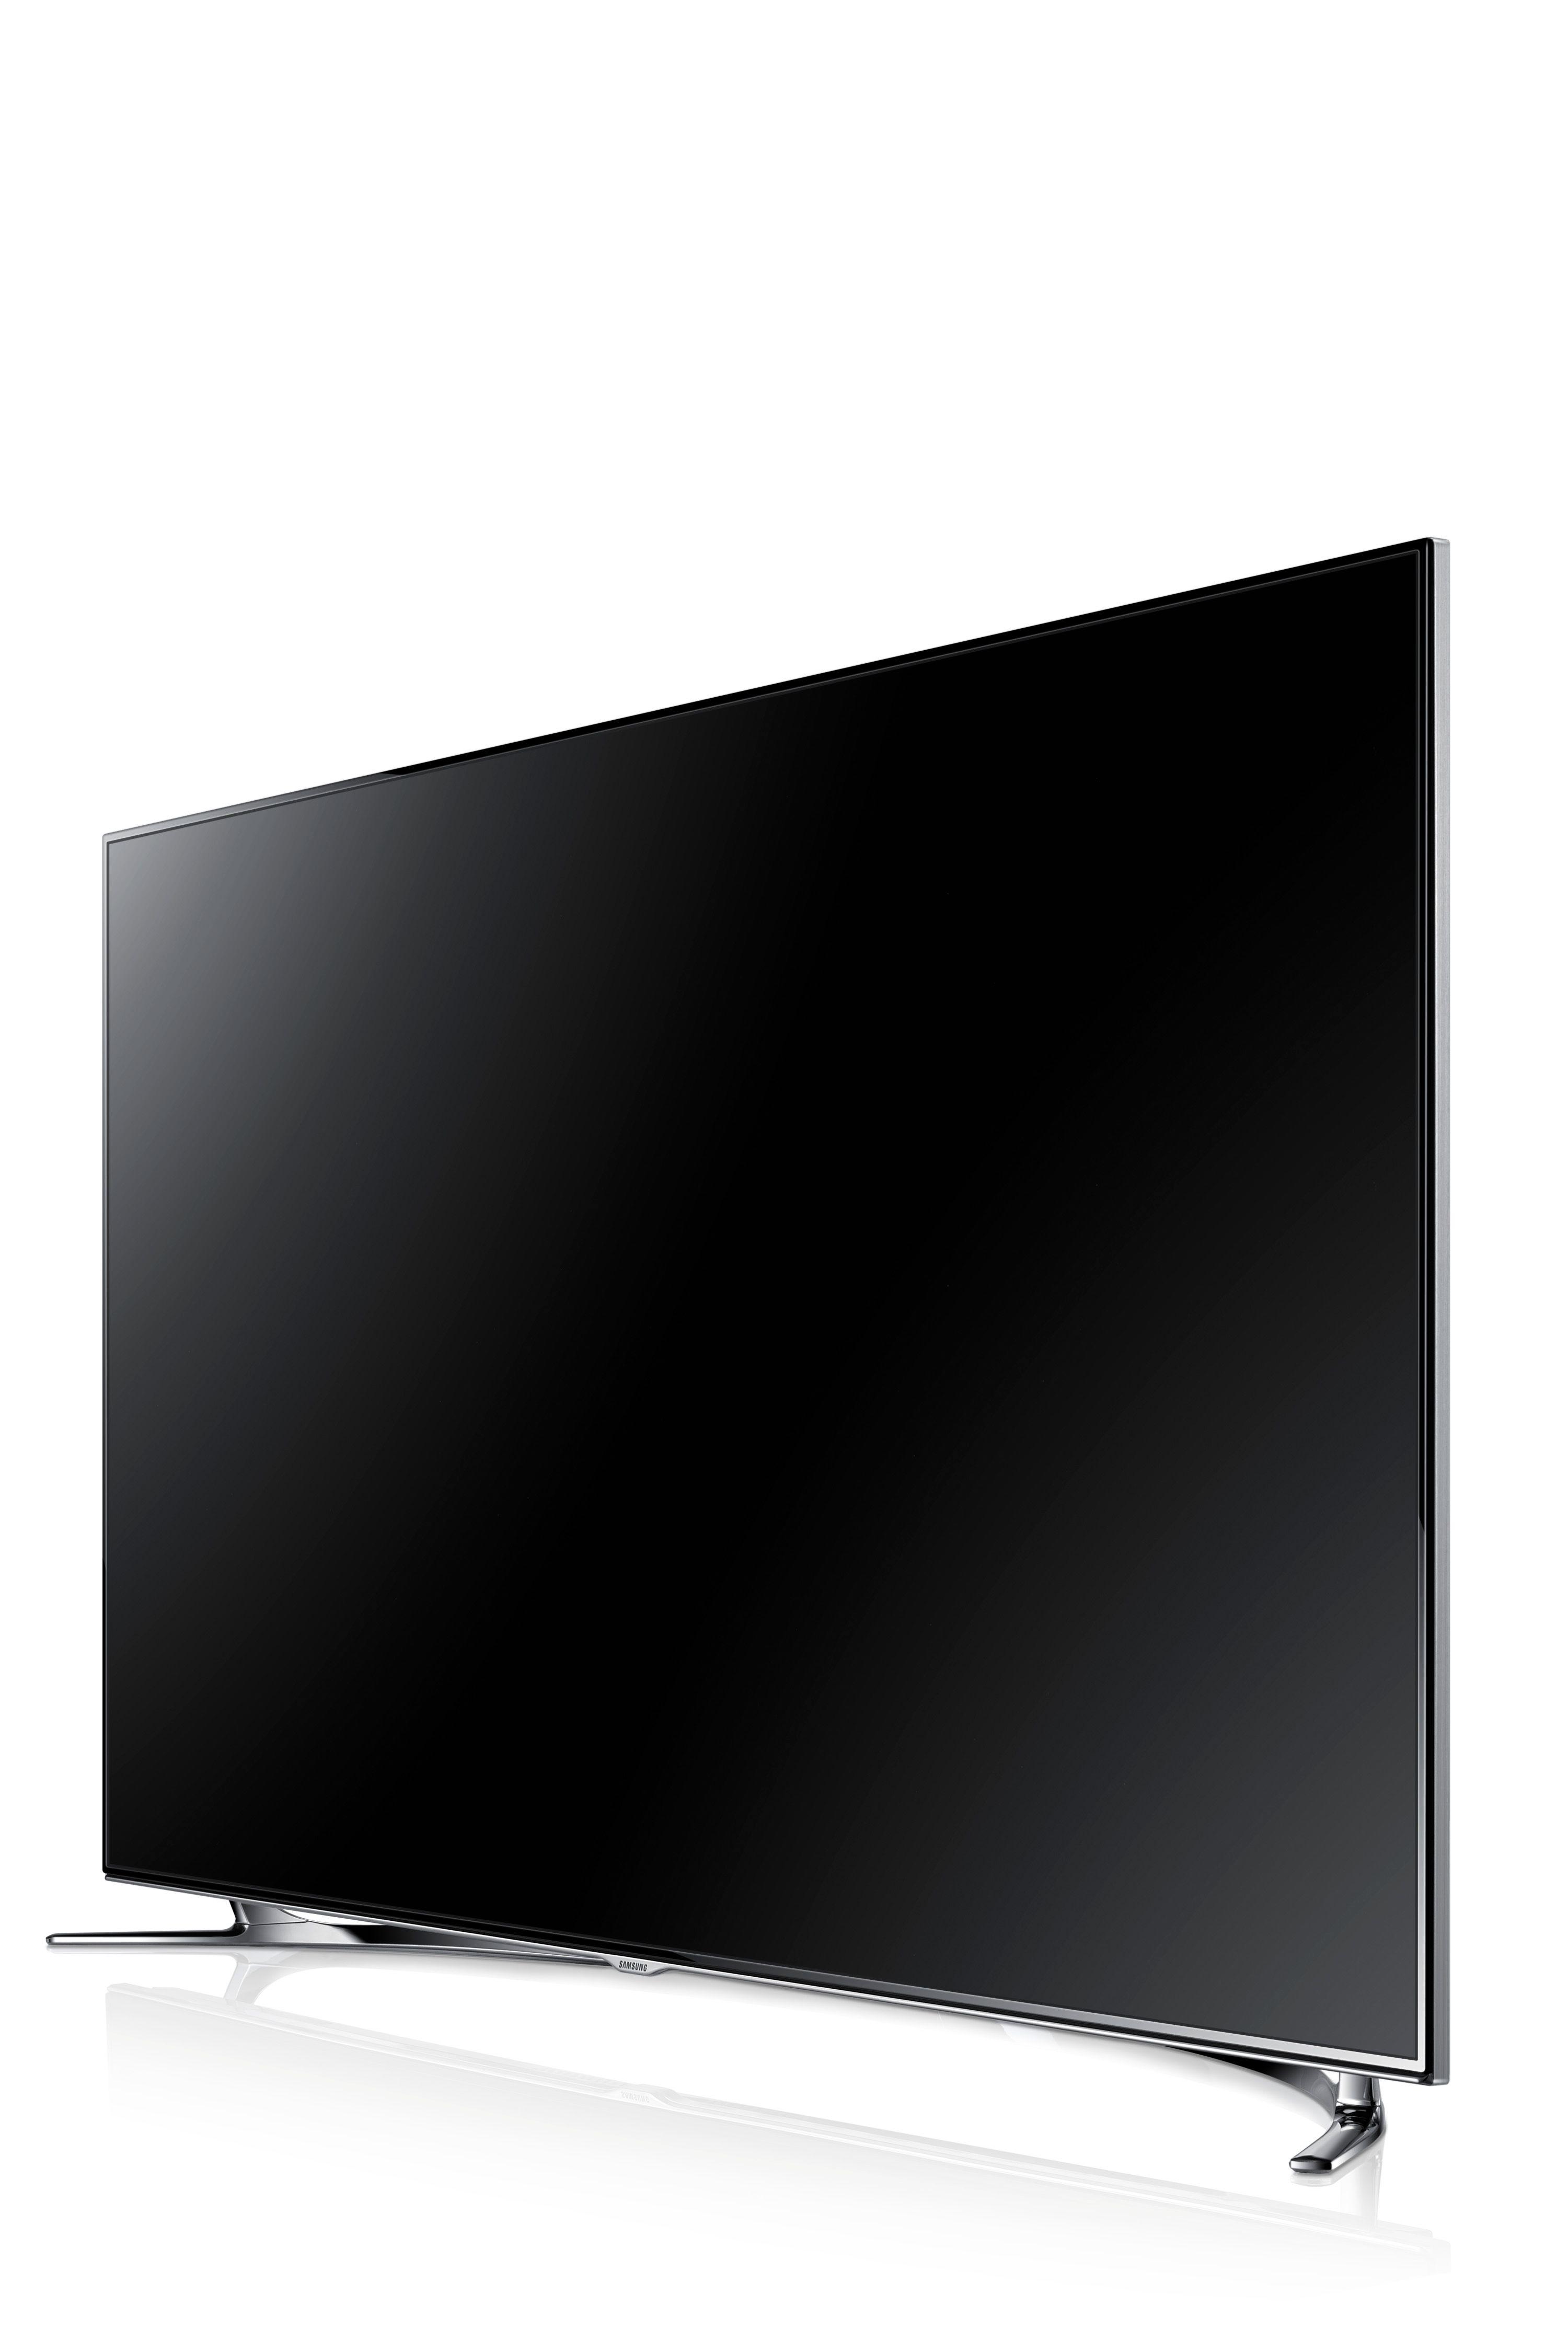 Samsung nye TV, F8000